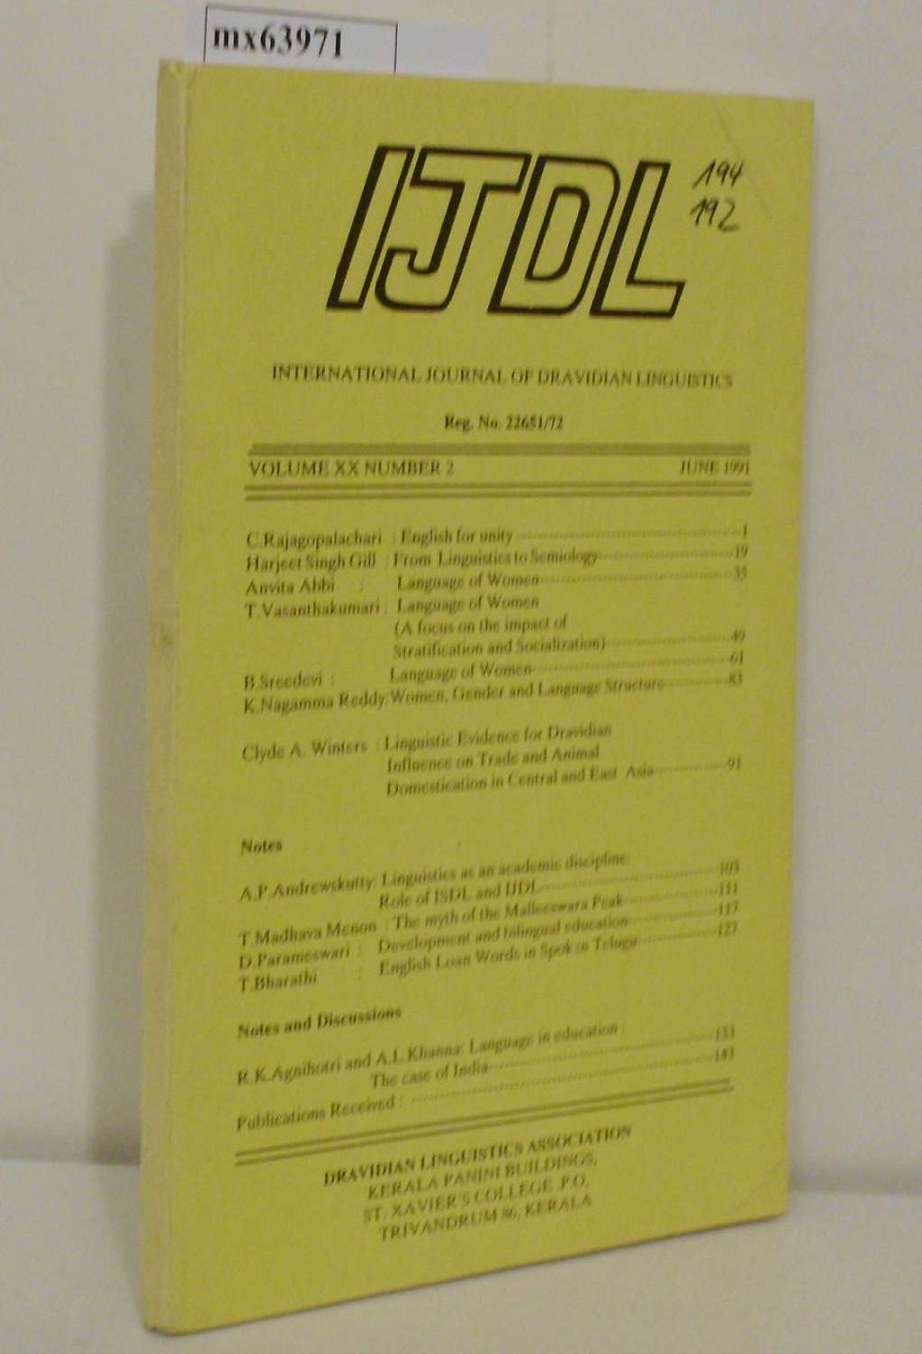 International Journal of Dravidian Linguistics Vol. XX, No. 2, June 1991